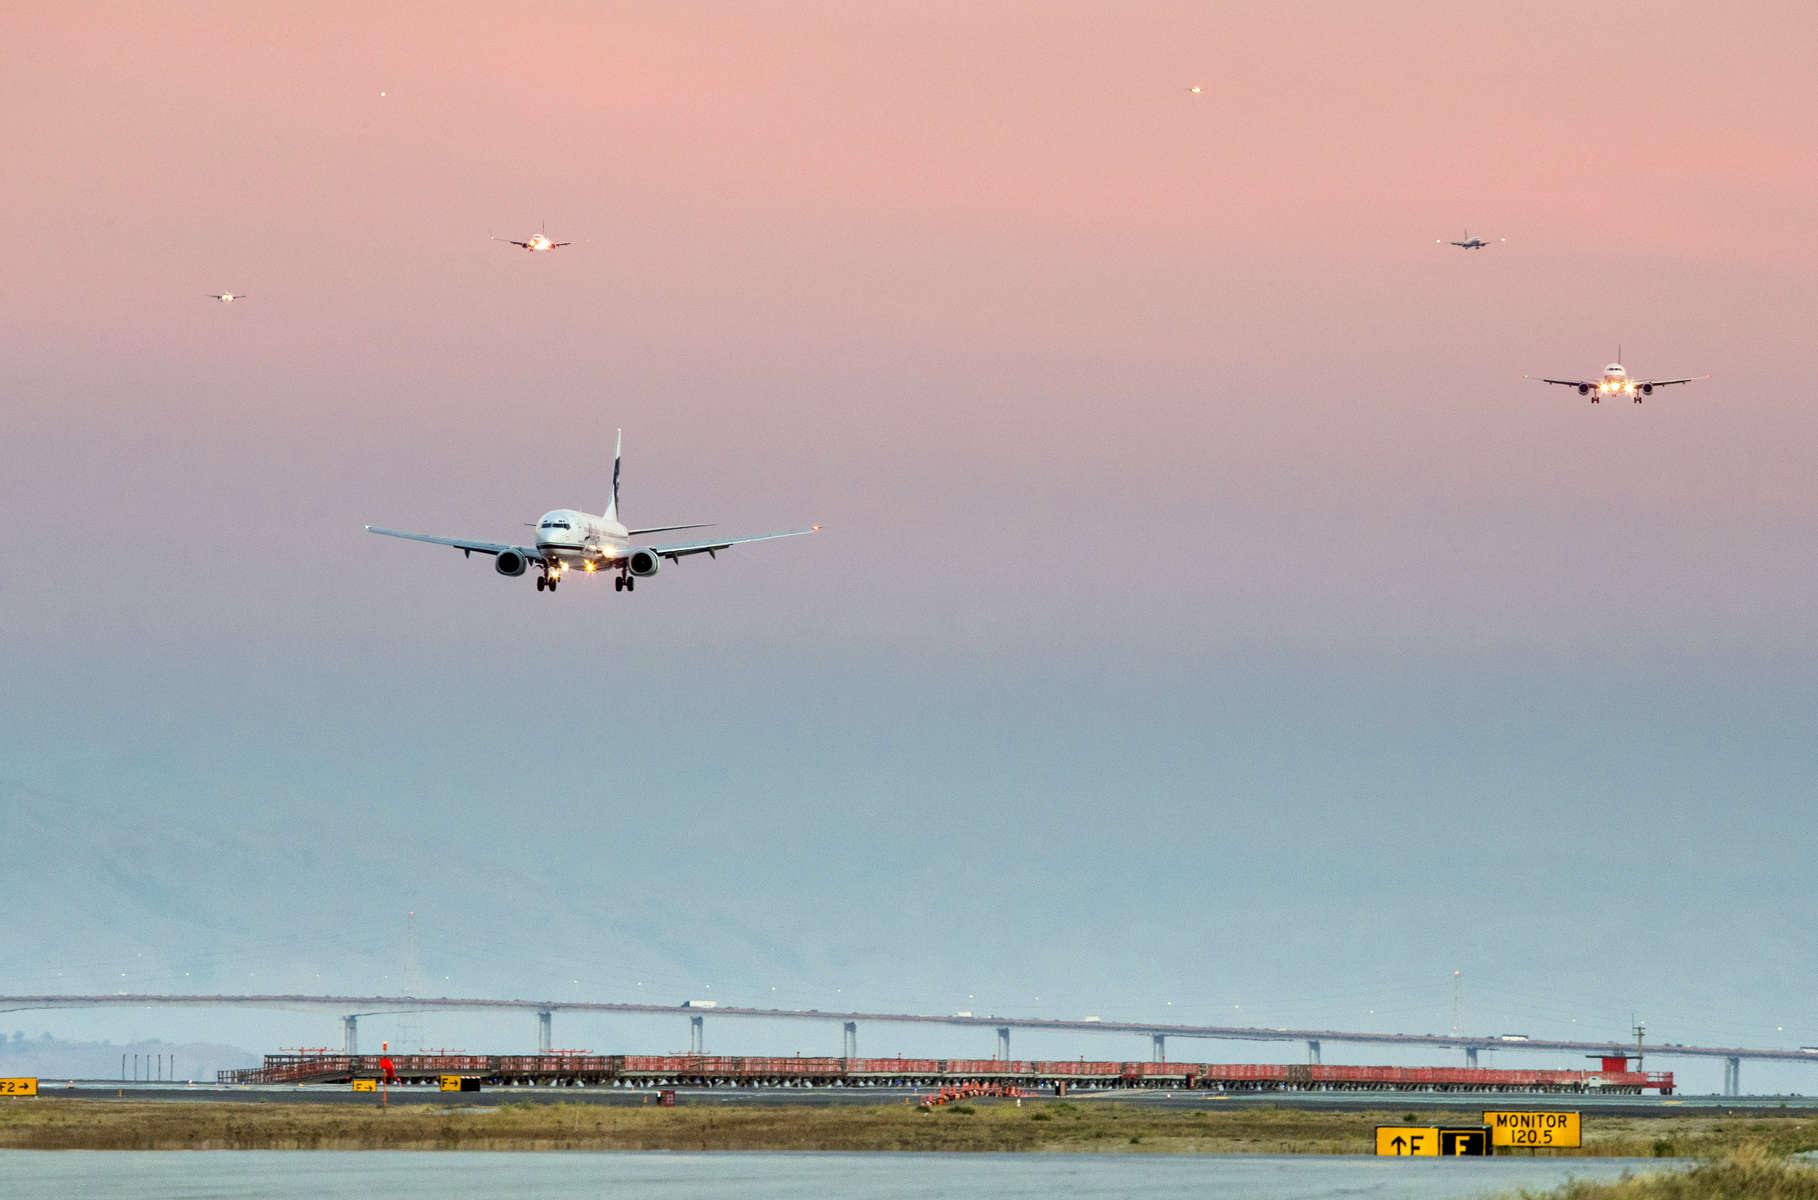 SFO Runway Extensions